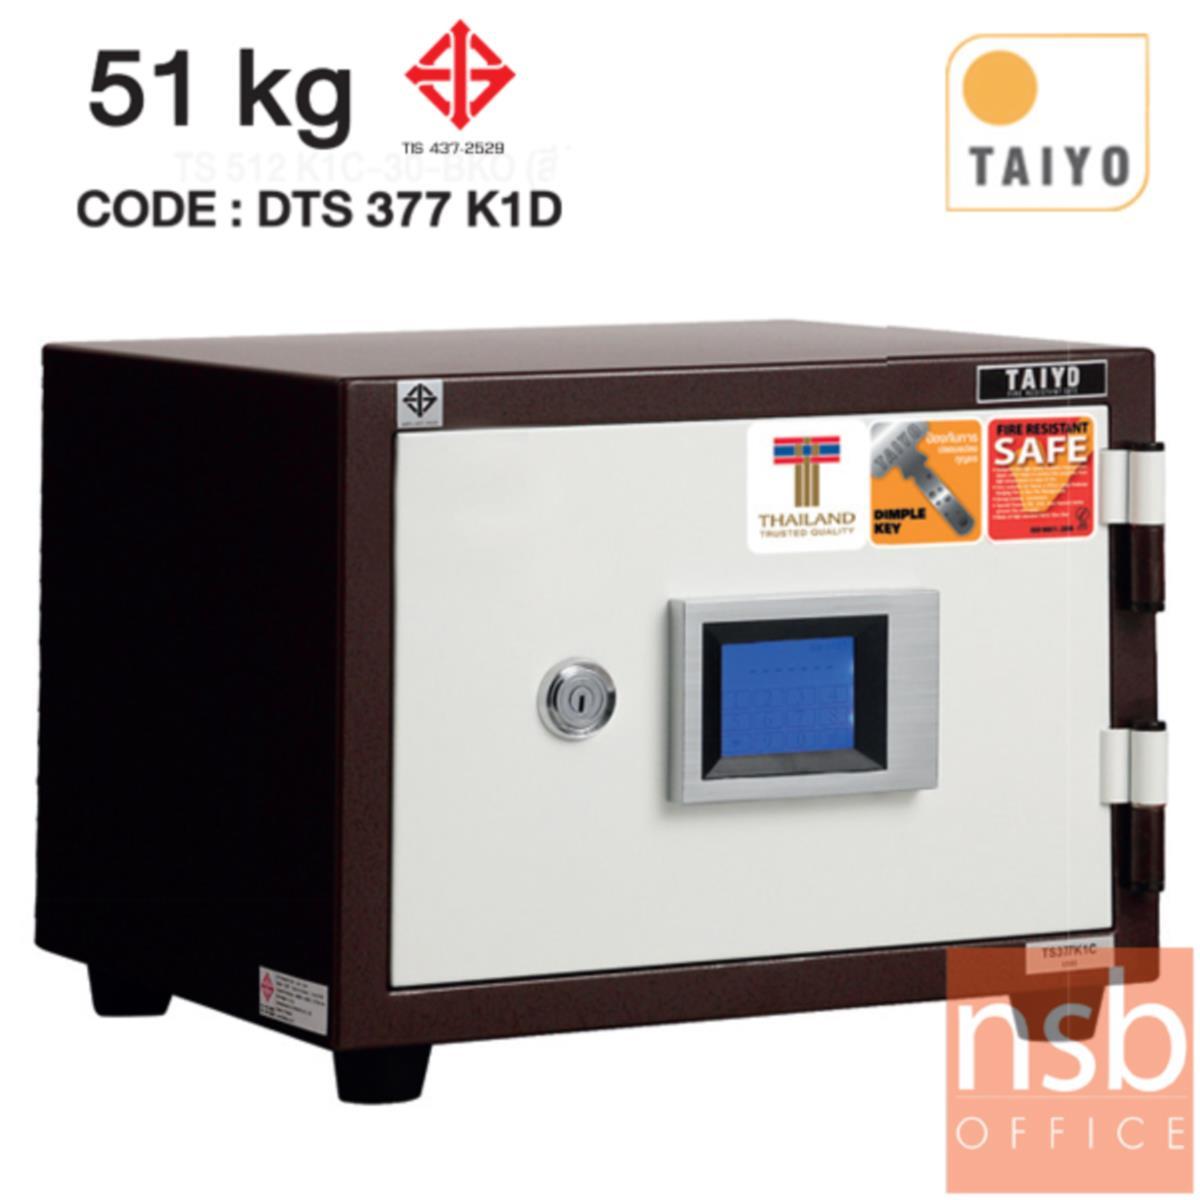 F03A005:ตู้เซฟดิจิตอลทัชสกรีน 51 กก. TAIYO Touch screen DTS 377 K1D มอก.